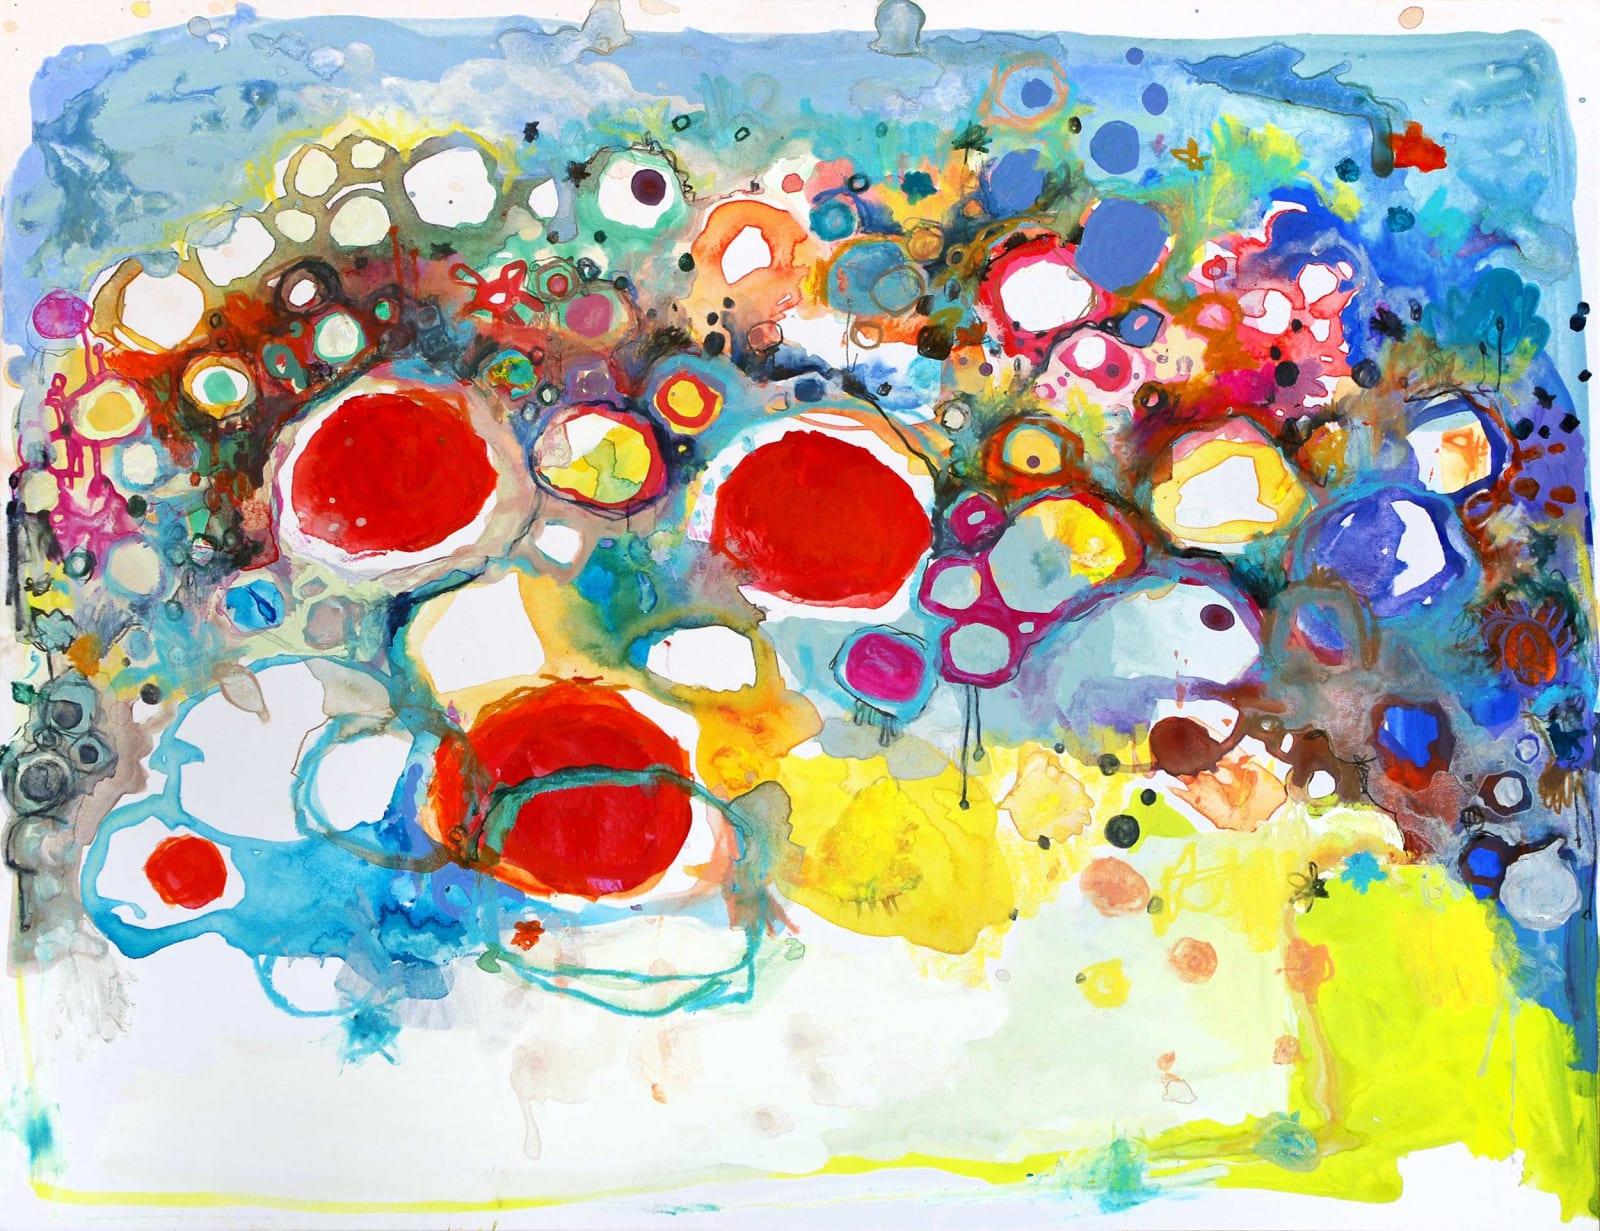 Clara Fialho. Untitled #302, 2016. Mixed Media on Paper. 10 × 13 in.